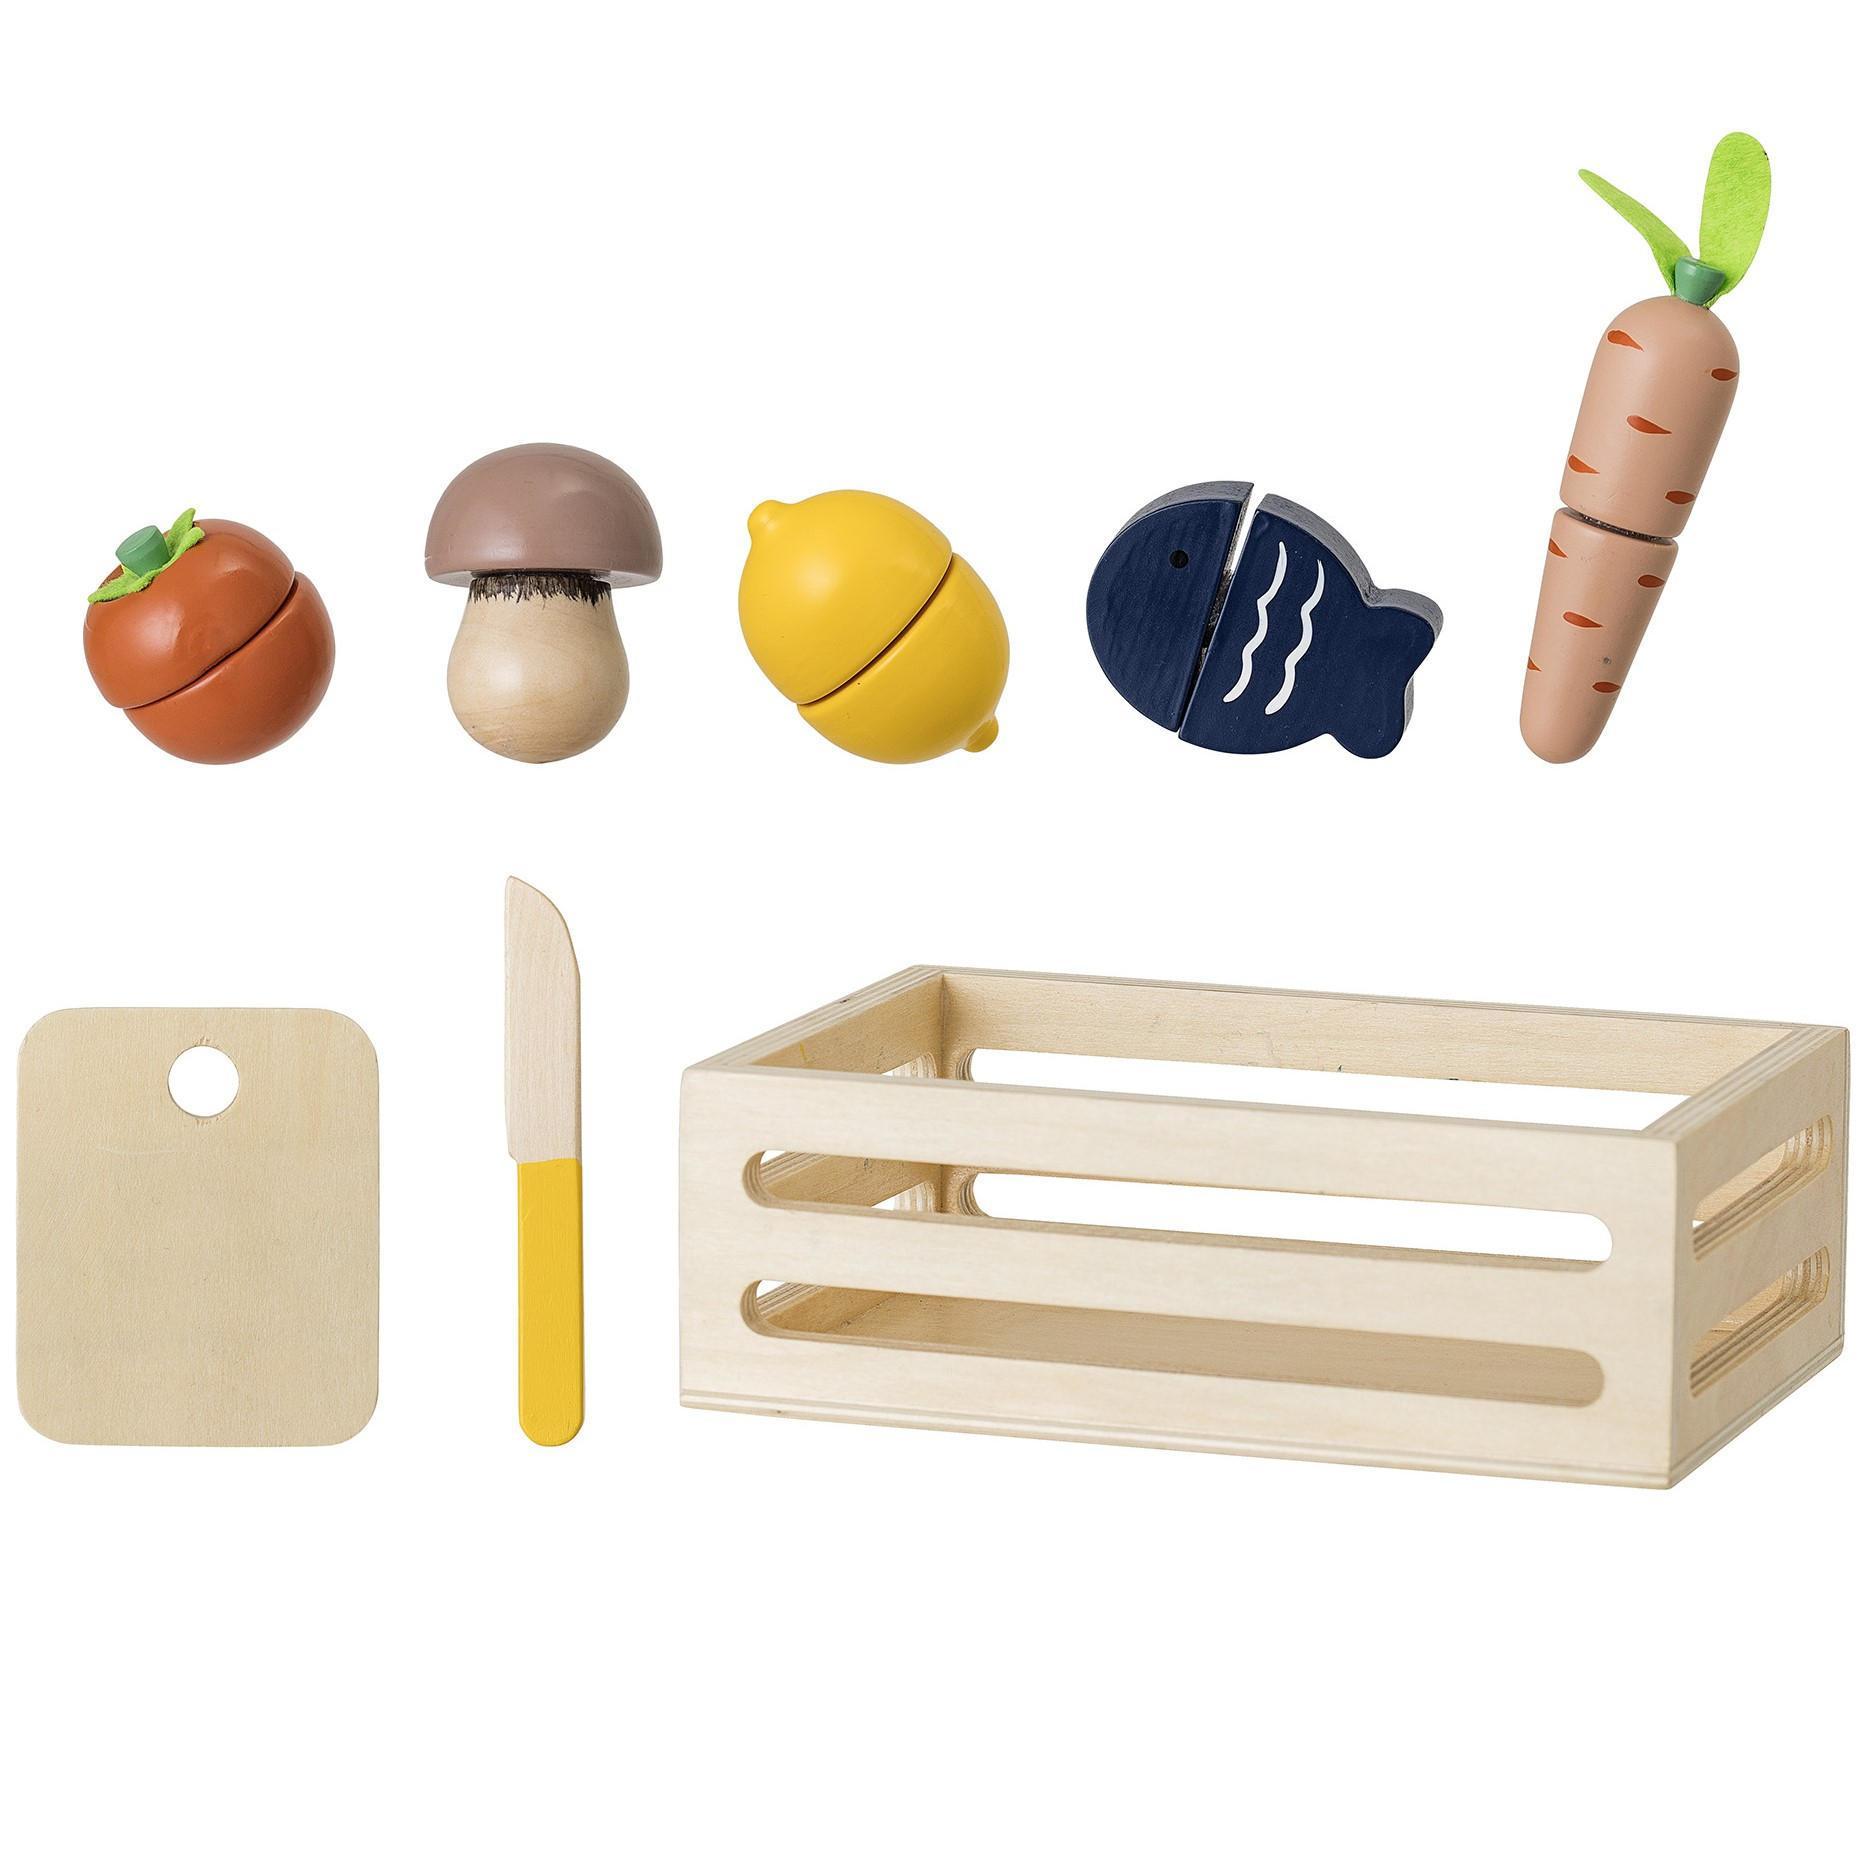 Bloomingville Dřevěné hračky Farm Market, multi barva, dřevo